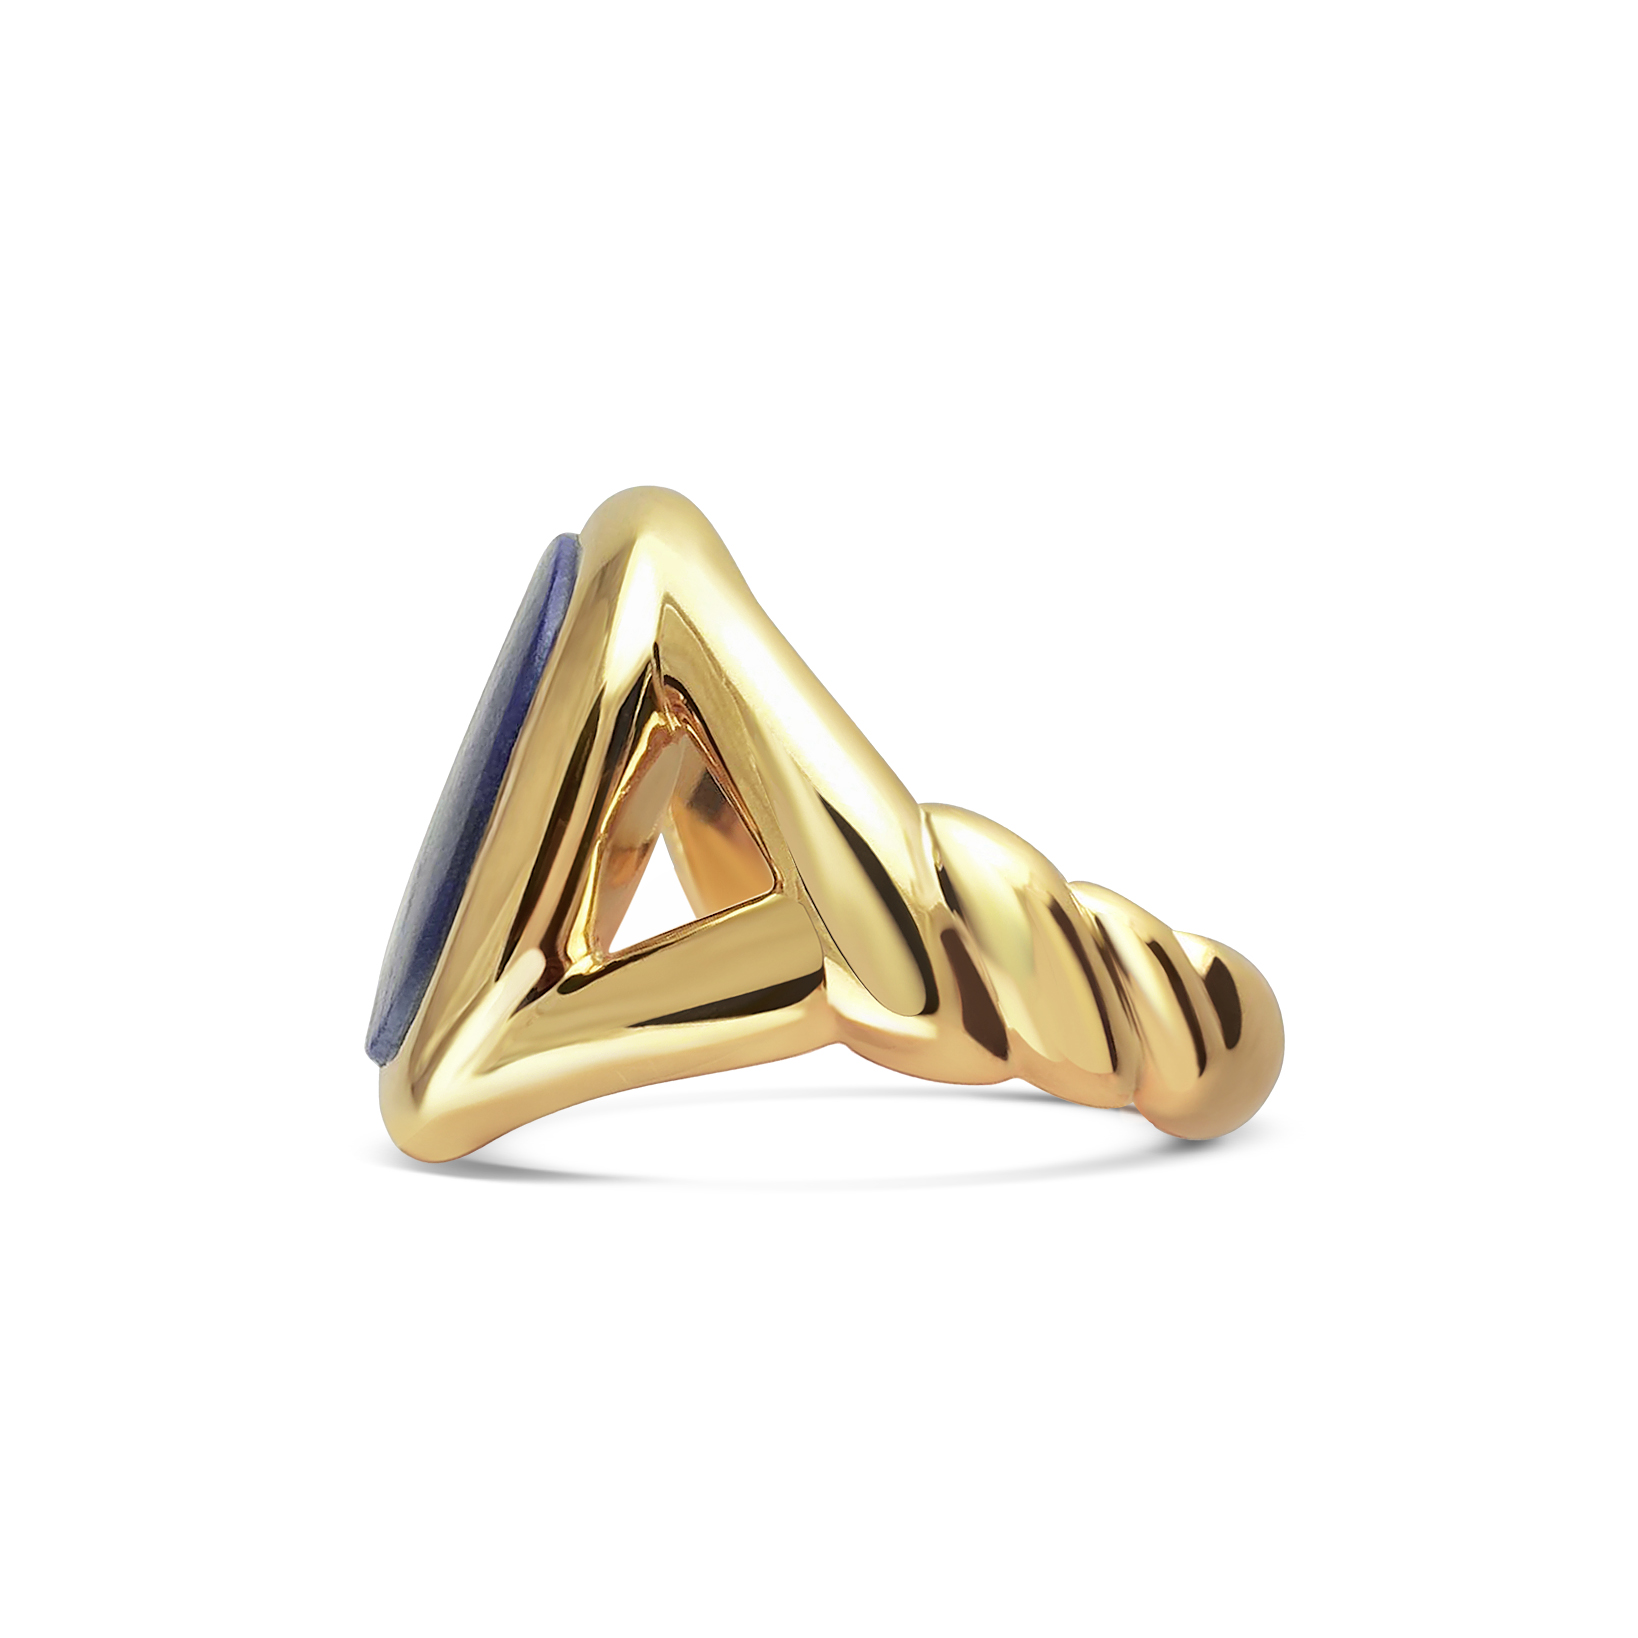 18ct-yellow-gold-and-lapis-signet-ring-3.jpg